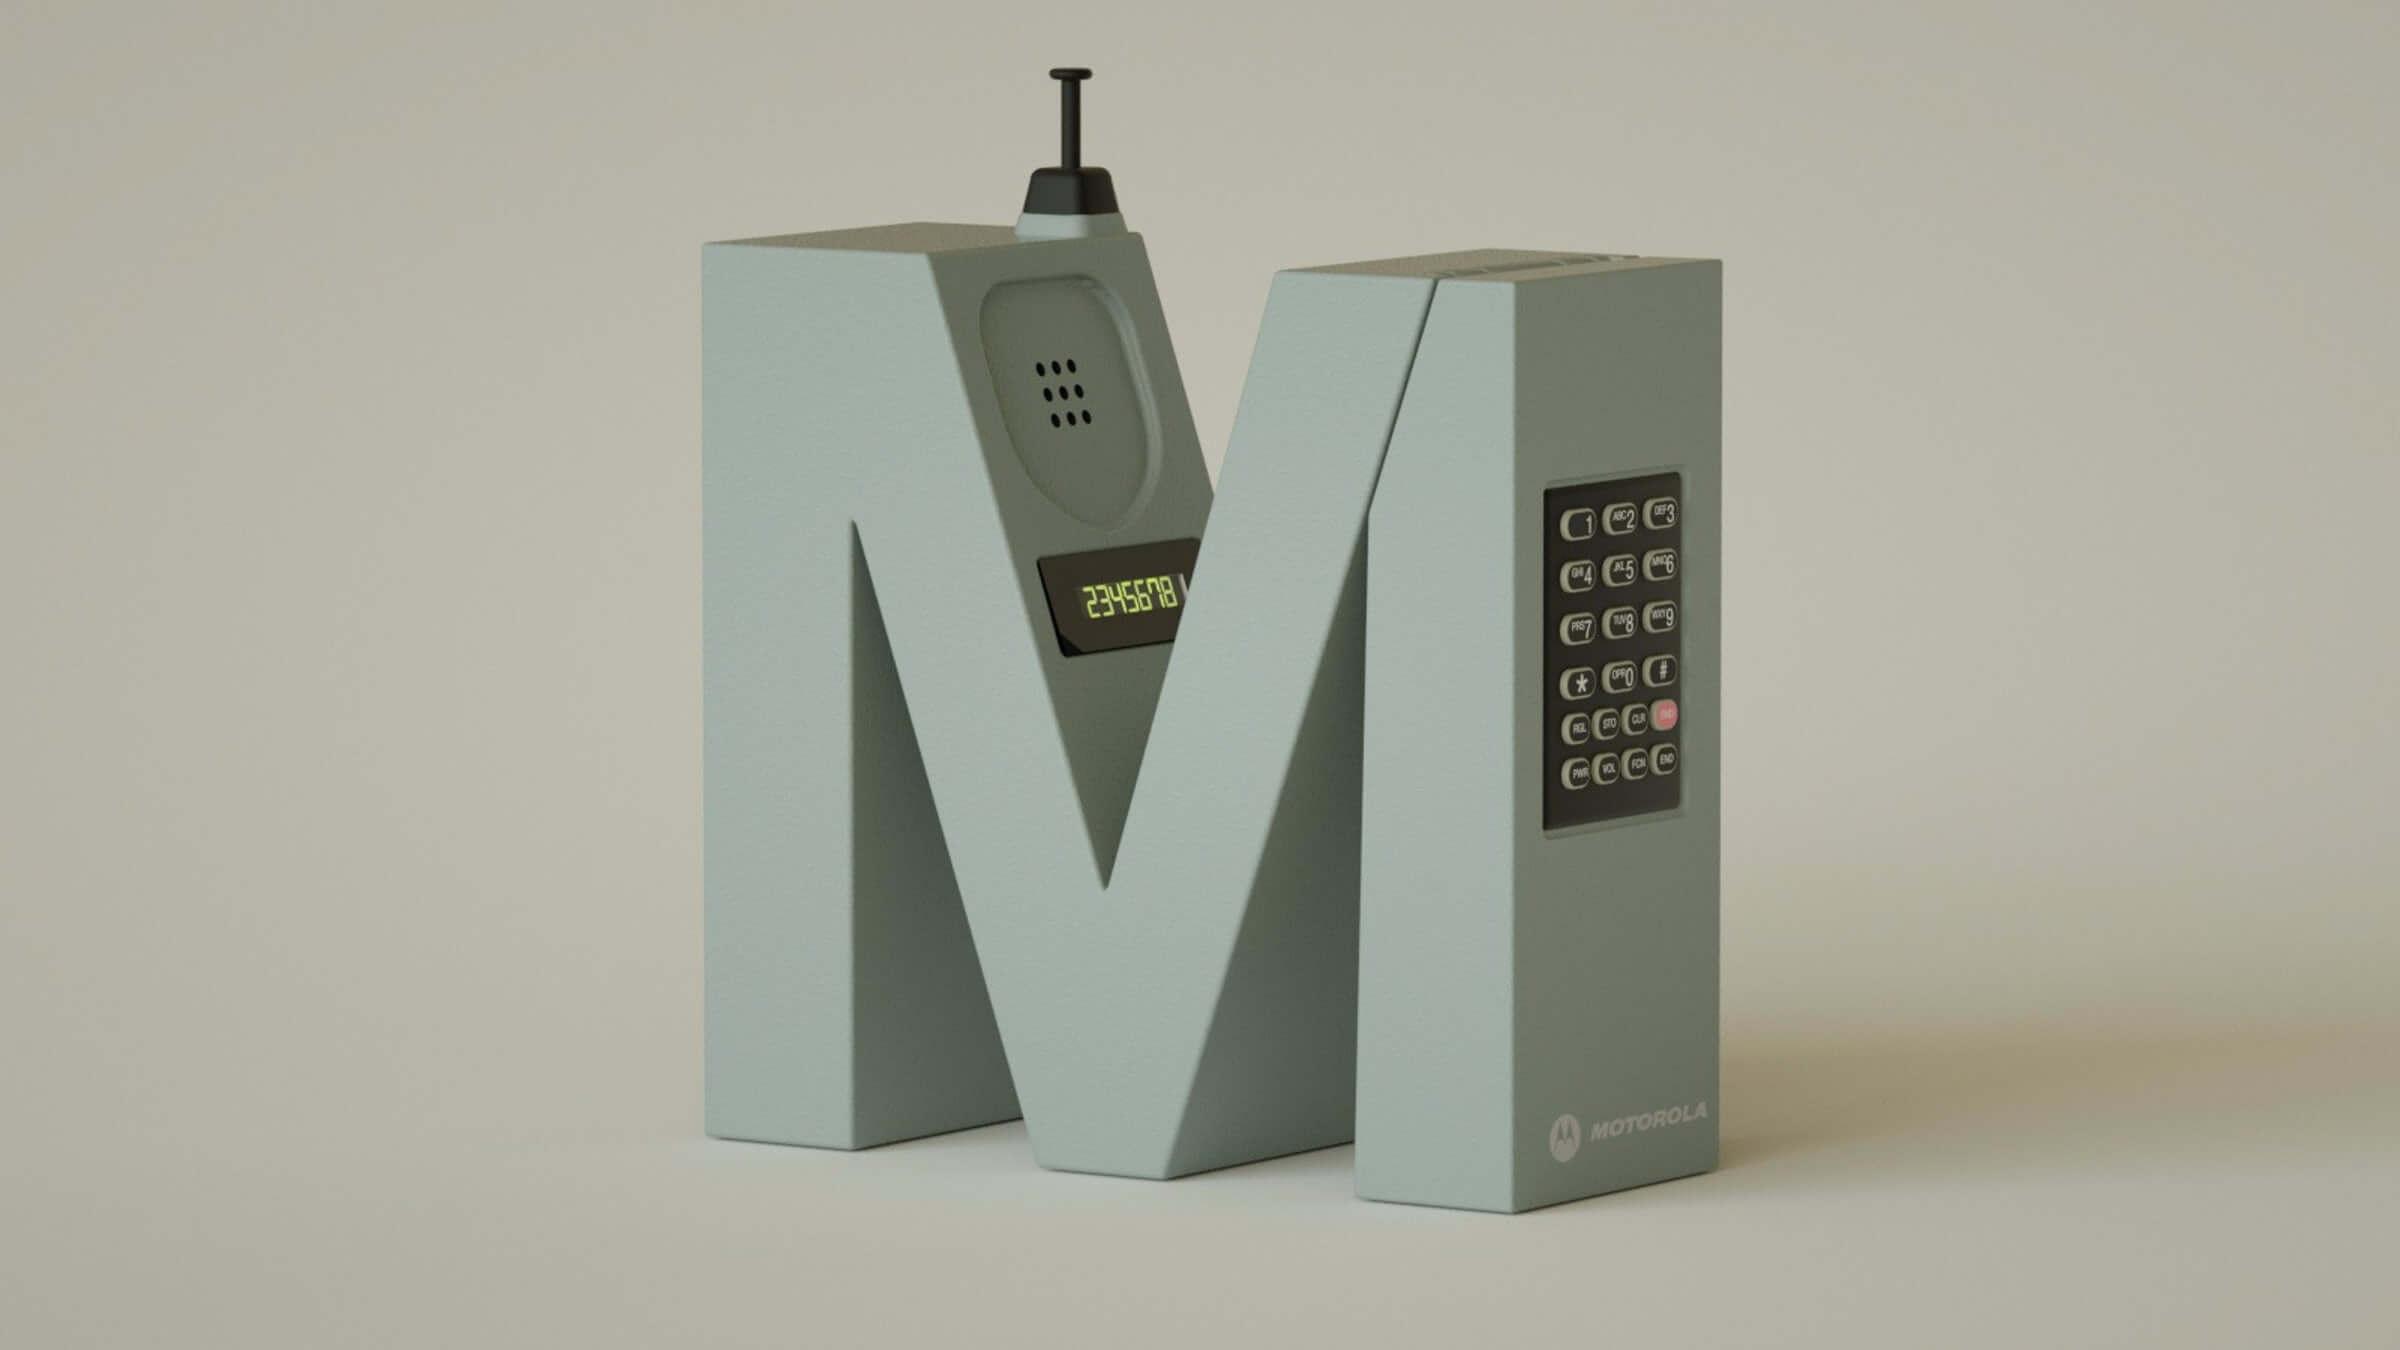 alphabet rendered vintage electronic gadgets 4 (1)